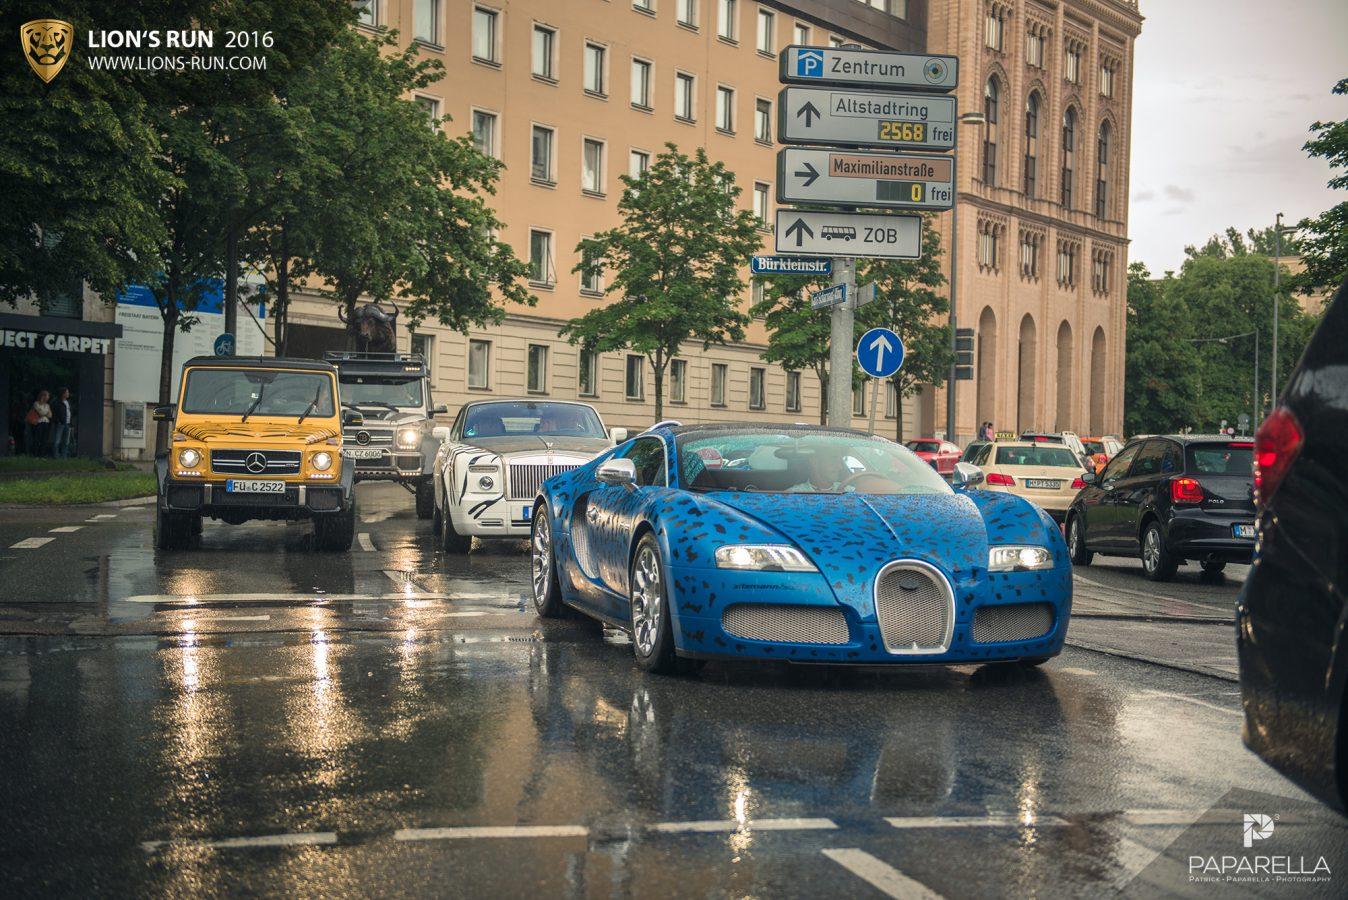 Lions_Run_summer_edition-2015_94